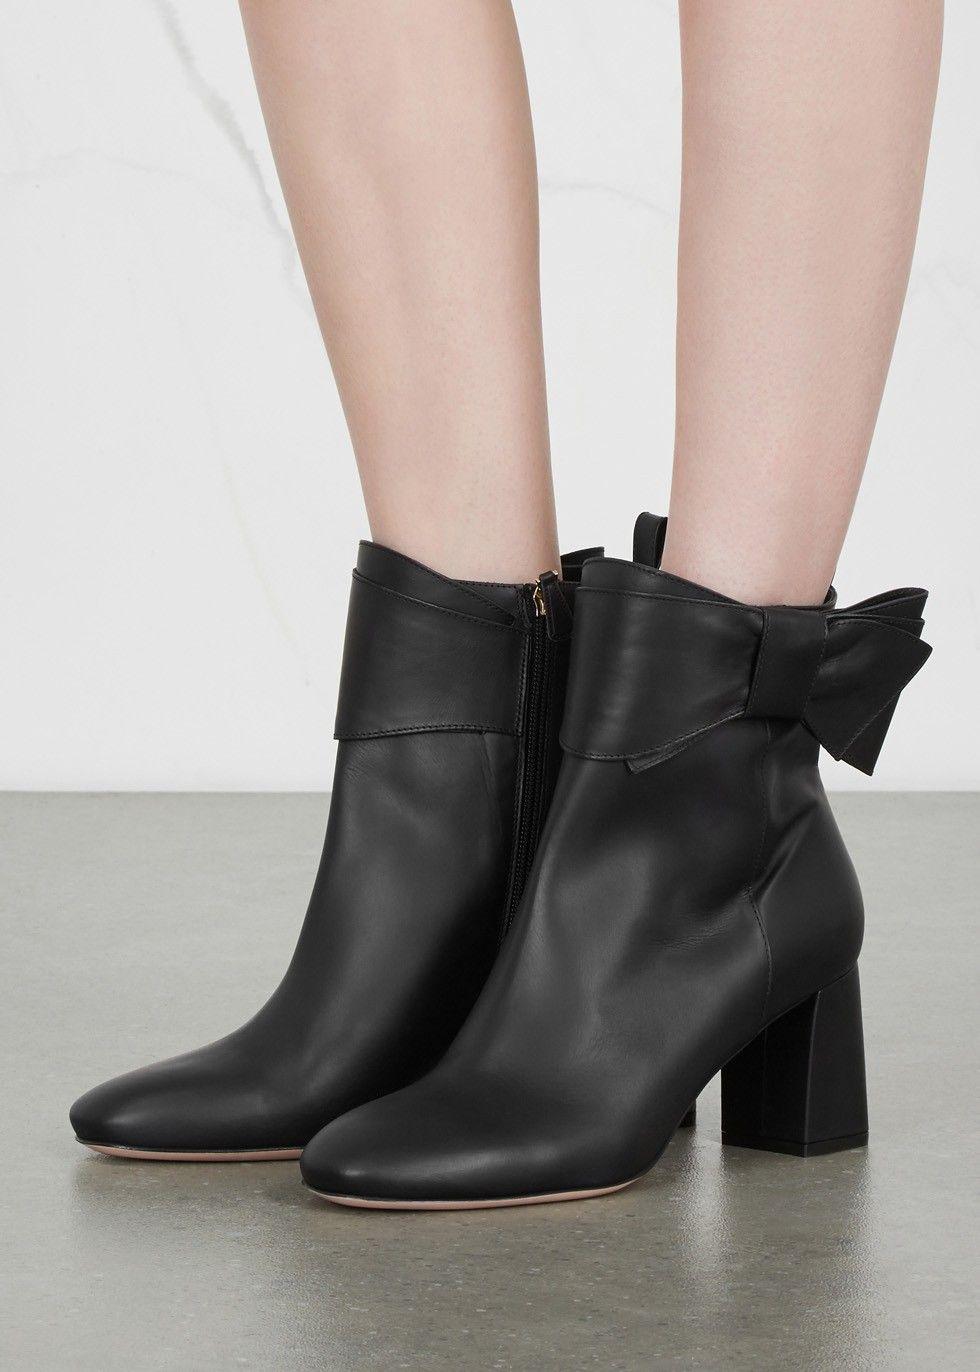 Valentino Embellished Round-Toe Ankle Boots sneakernews EaFOFUU